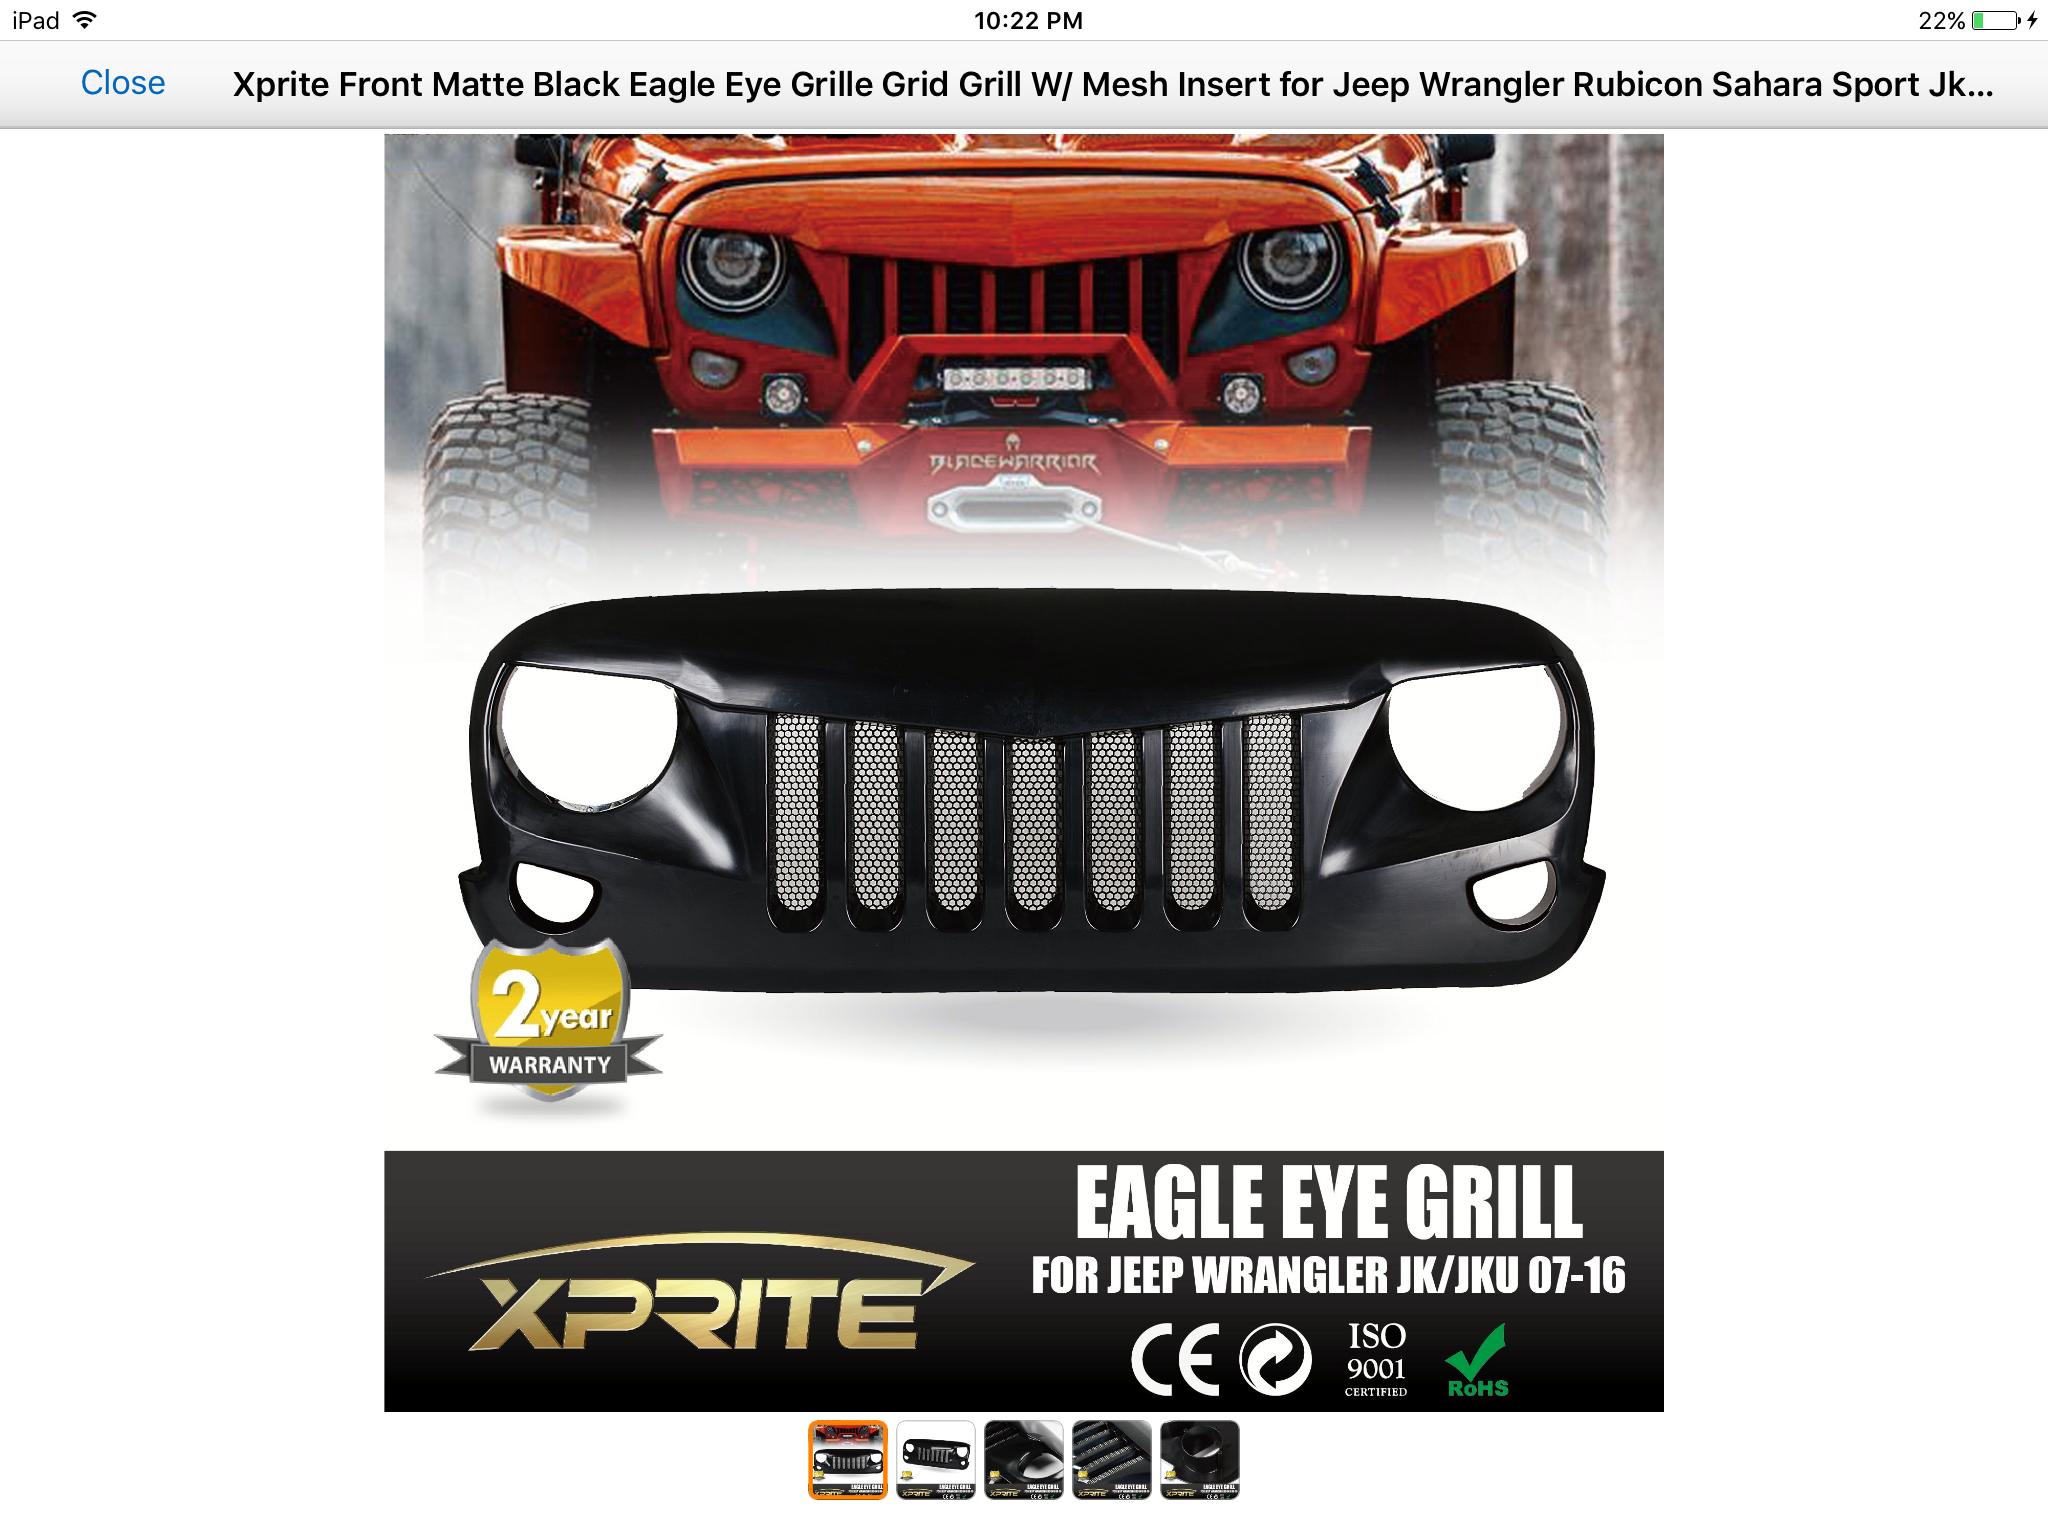 Pin By Tiffany Powell On Jeep Jeep Wrangler Jeep Wrangler Grill Jeep Wrangler Jk